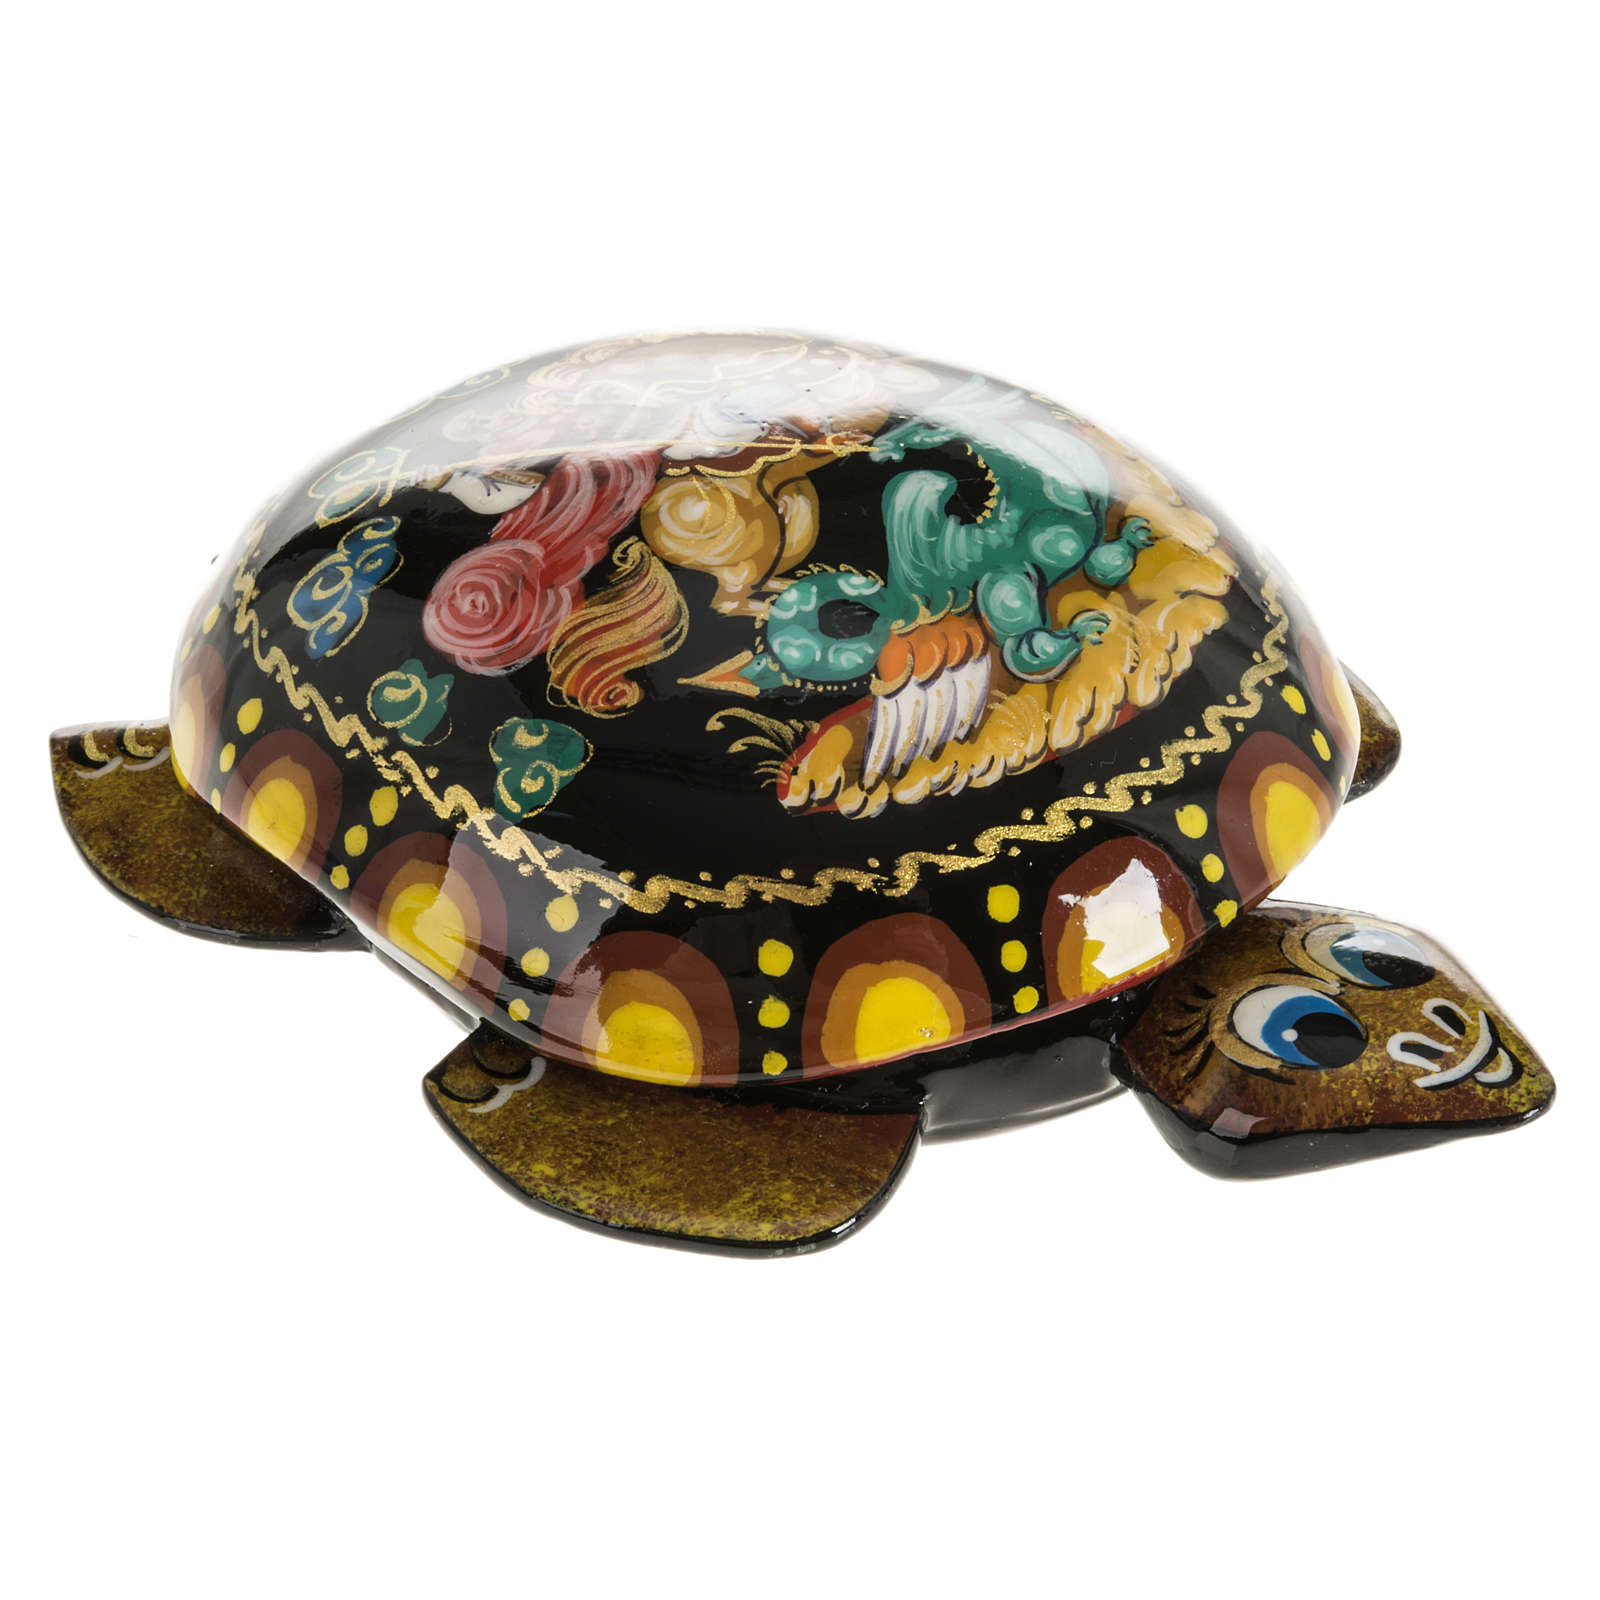 Scatola lacca tartaruga gialla San Giorgio Kholuy 4